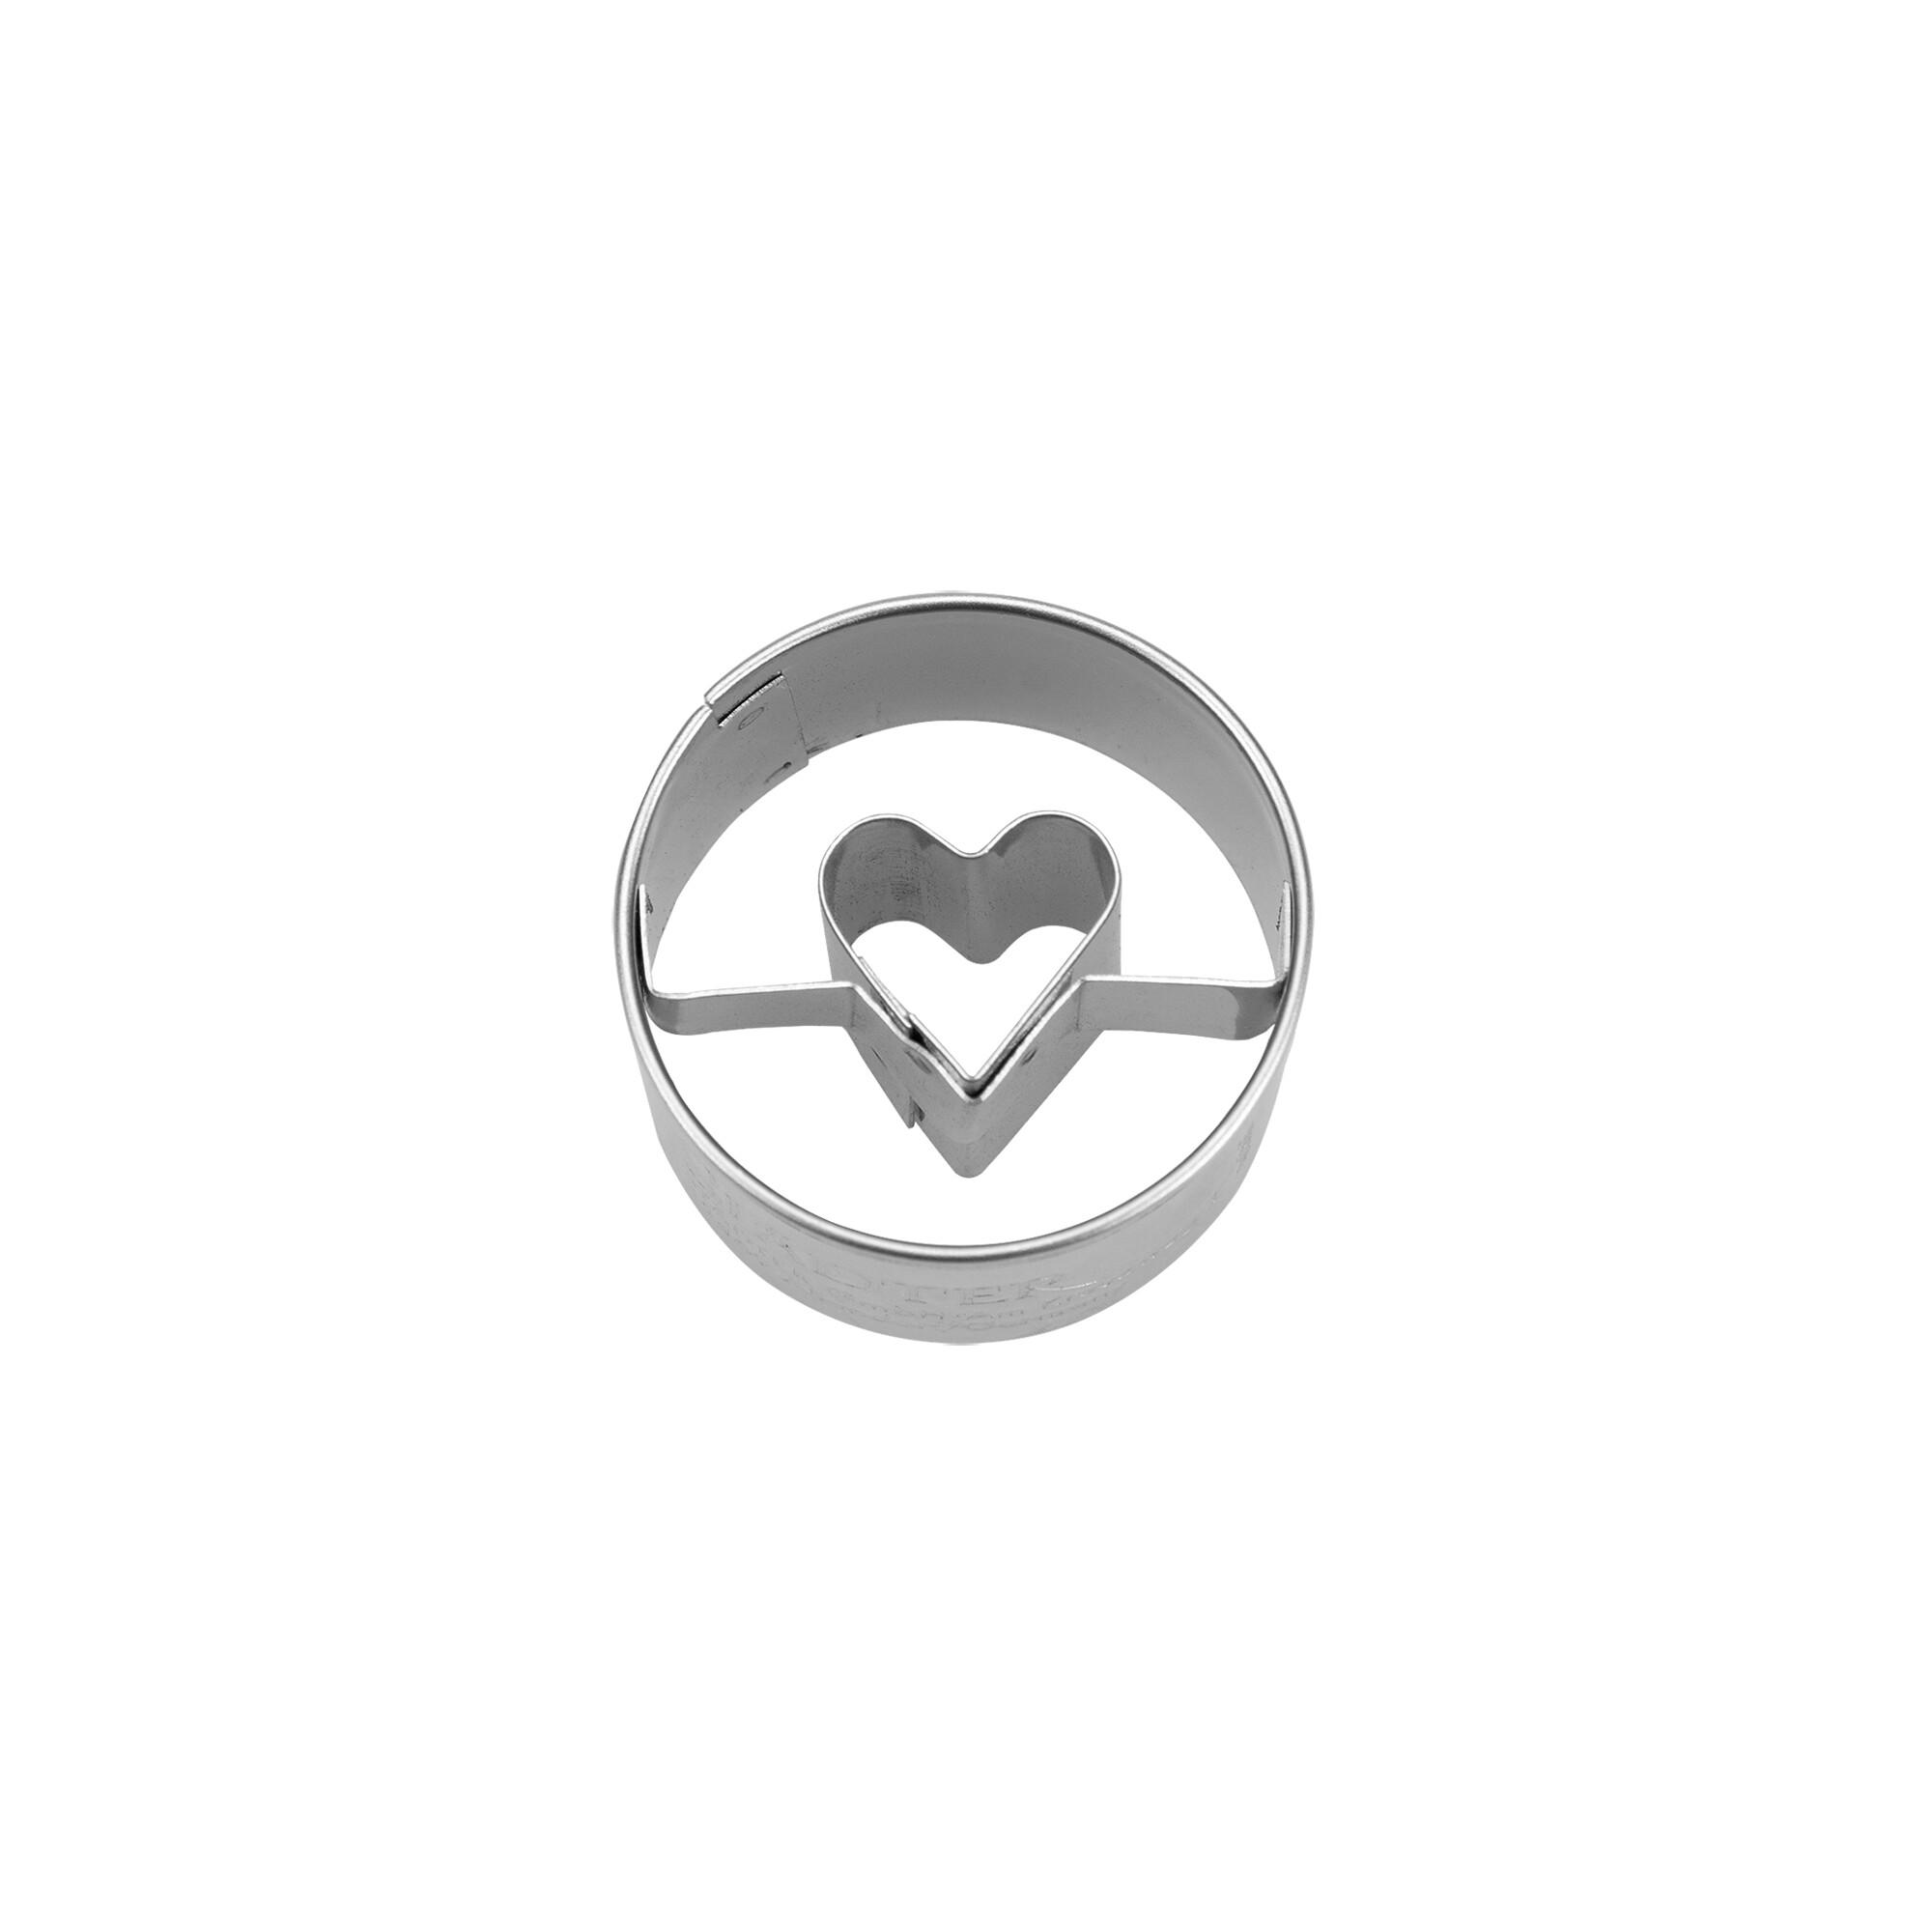 Ausstecher - Herz in Ring - Mini